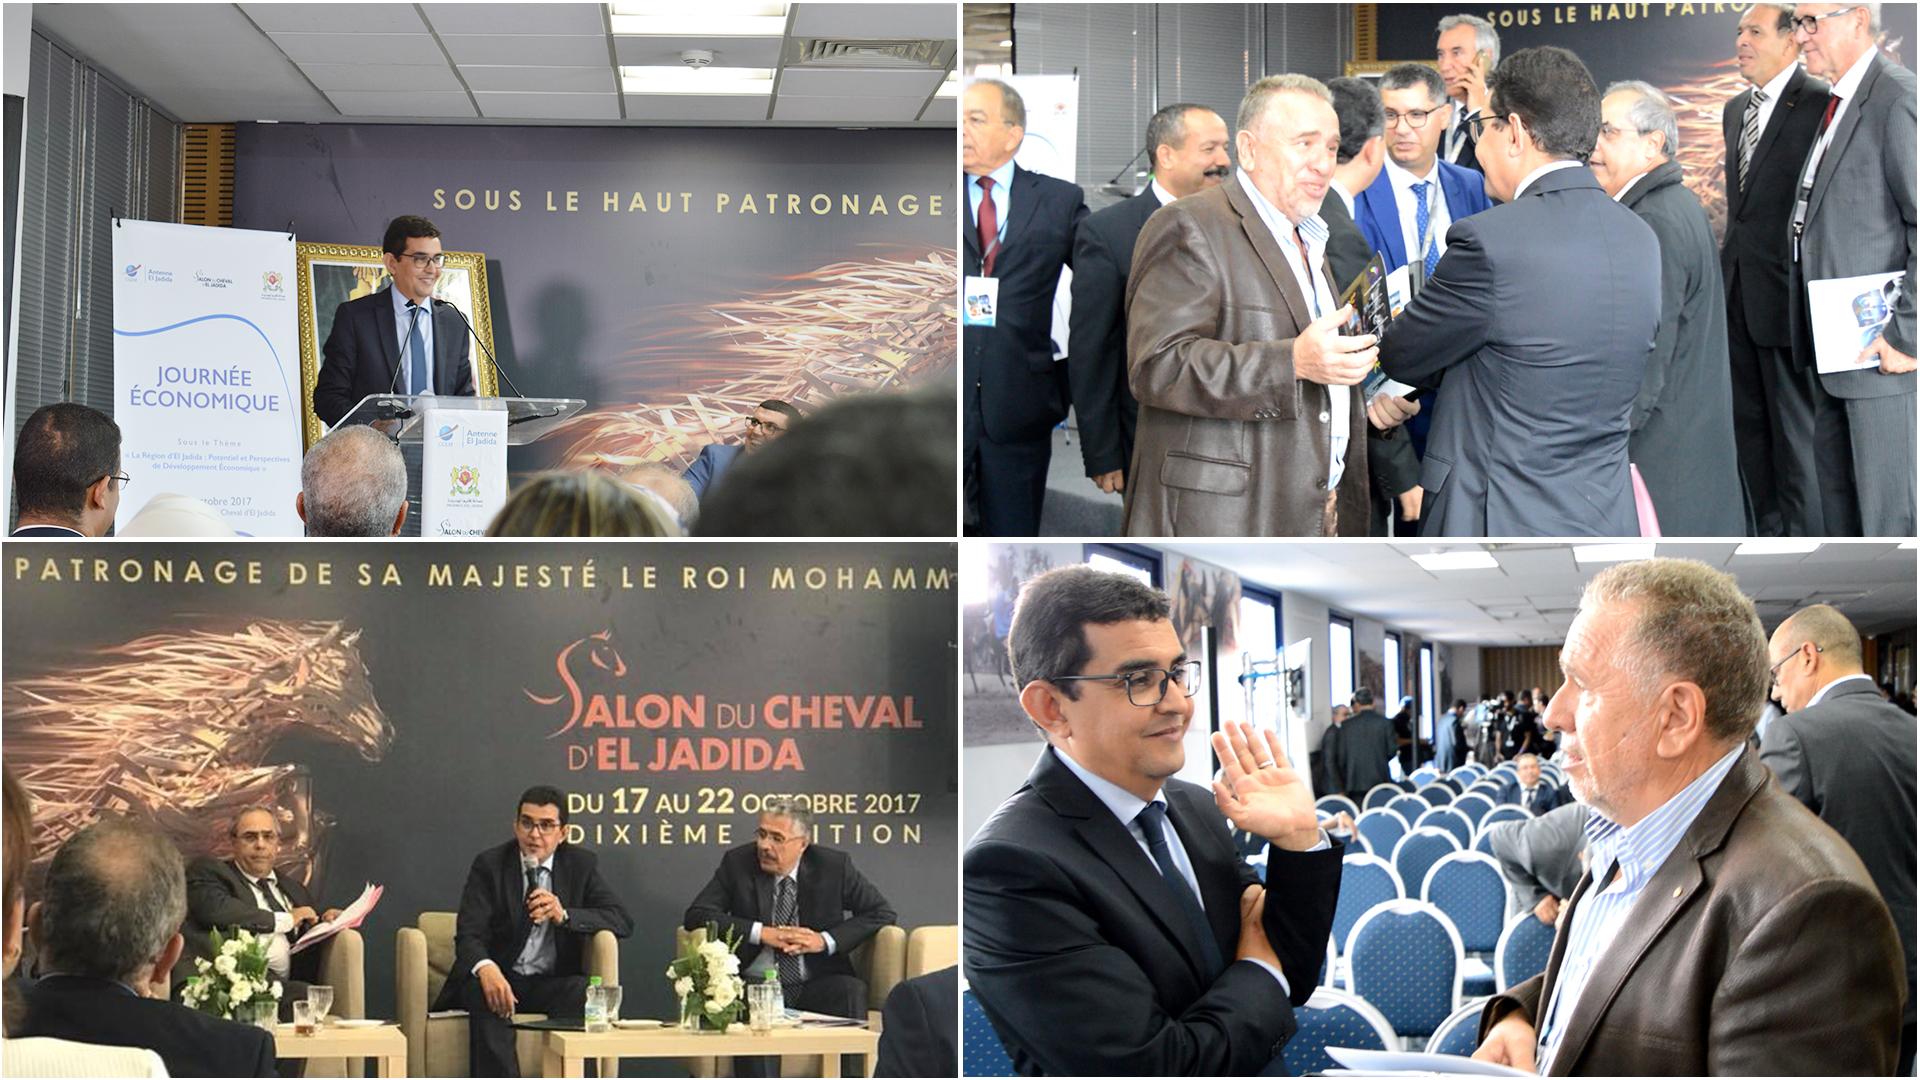 journee-economique-eljadida-salon-du-cheval-cgem-el-jadida-maroc